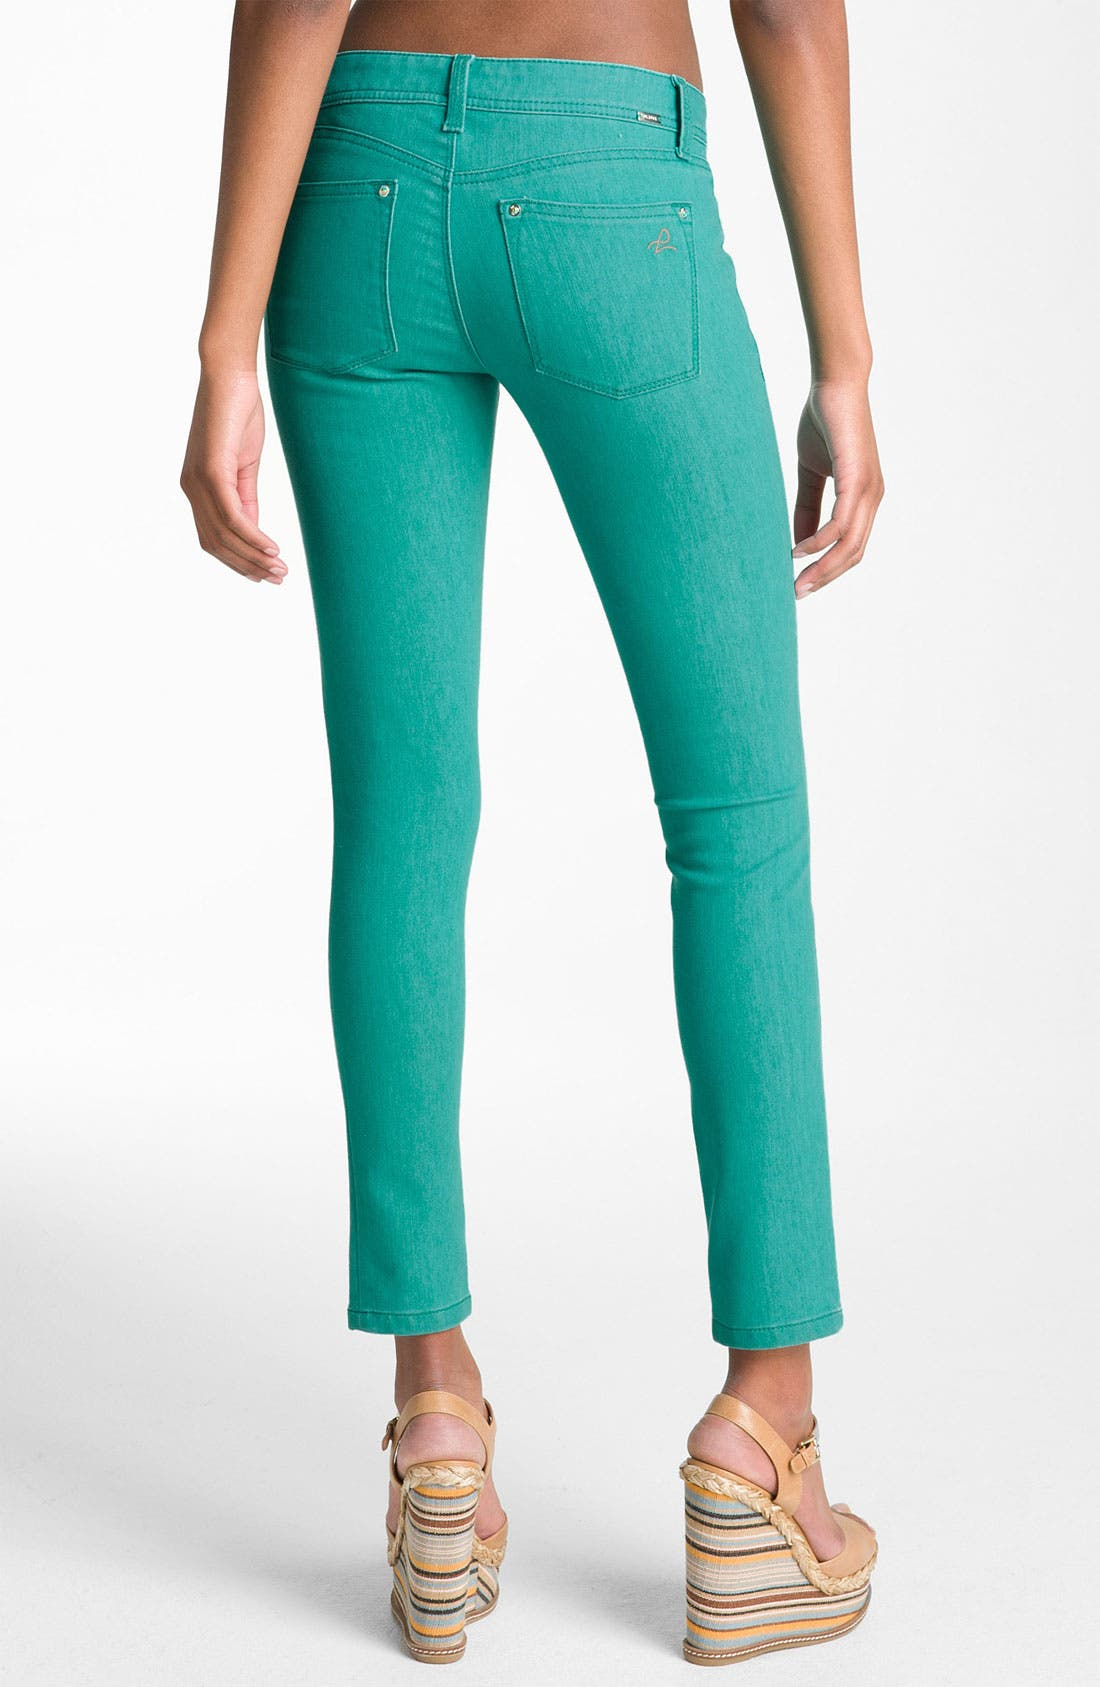 Alternate Image 2  - DL1961 'Emma' Skinny Jeans (Seaglass)